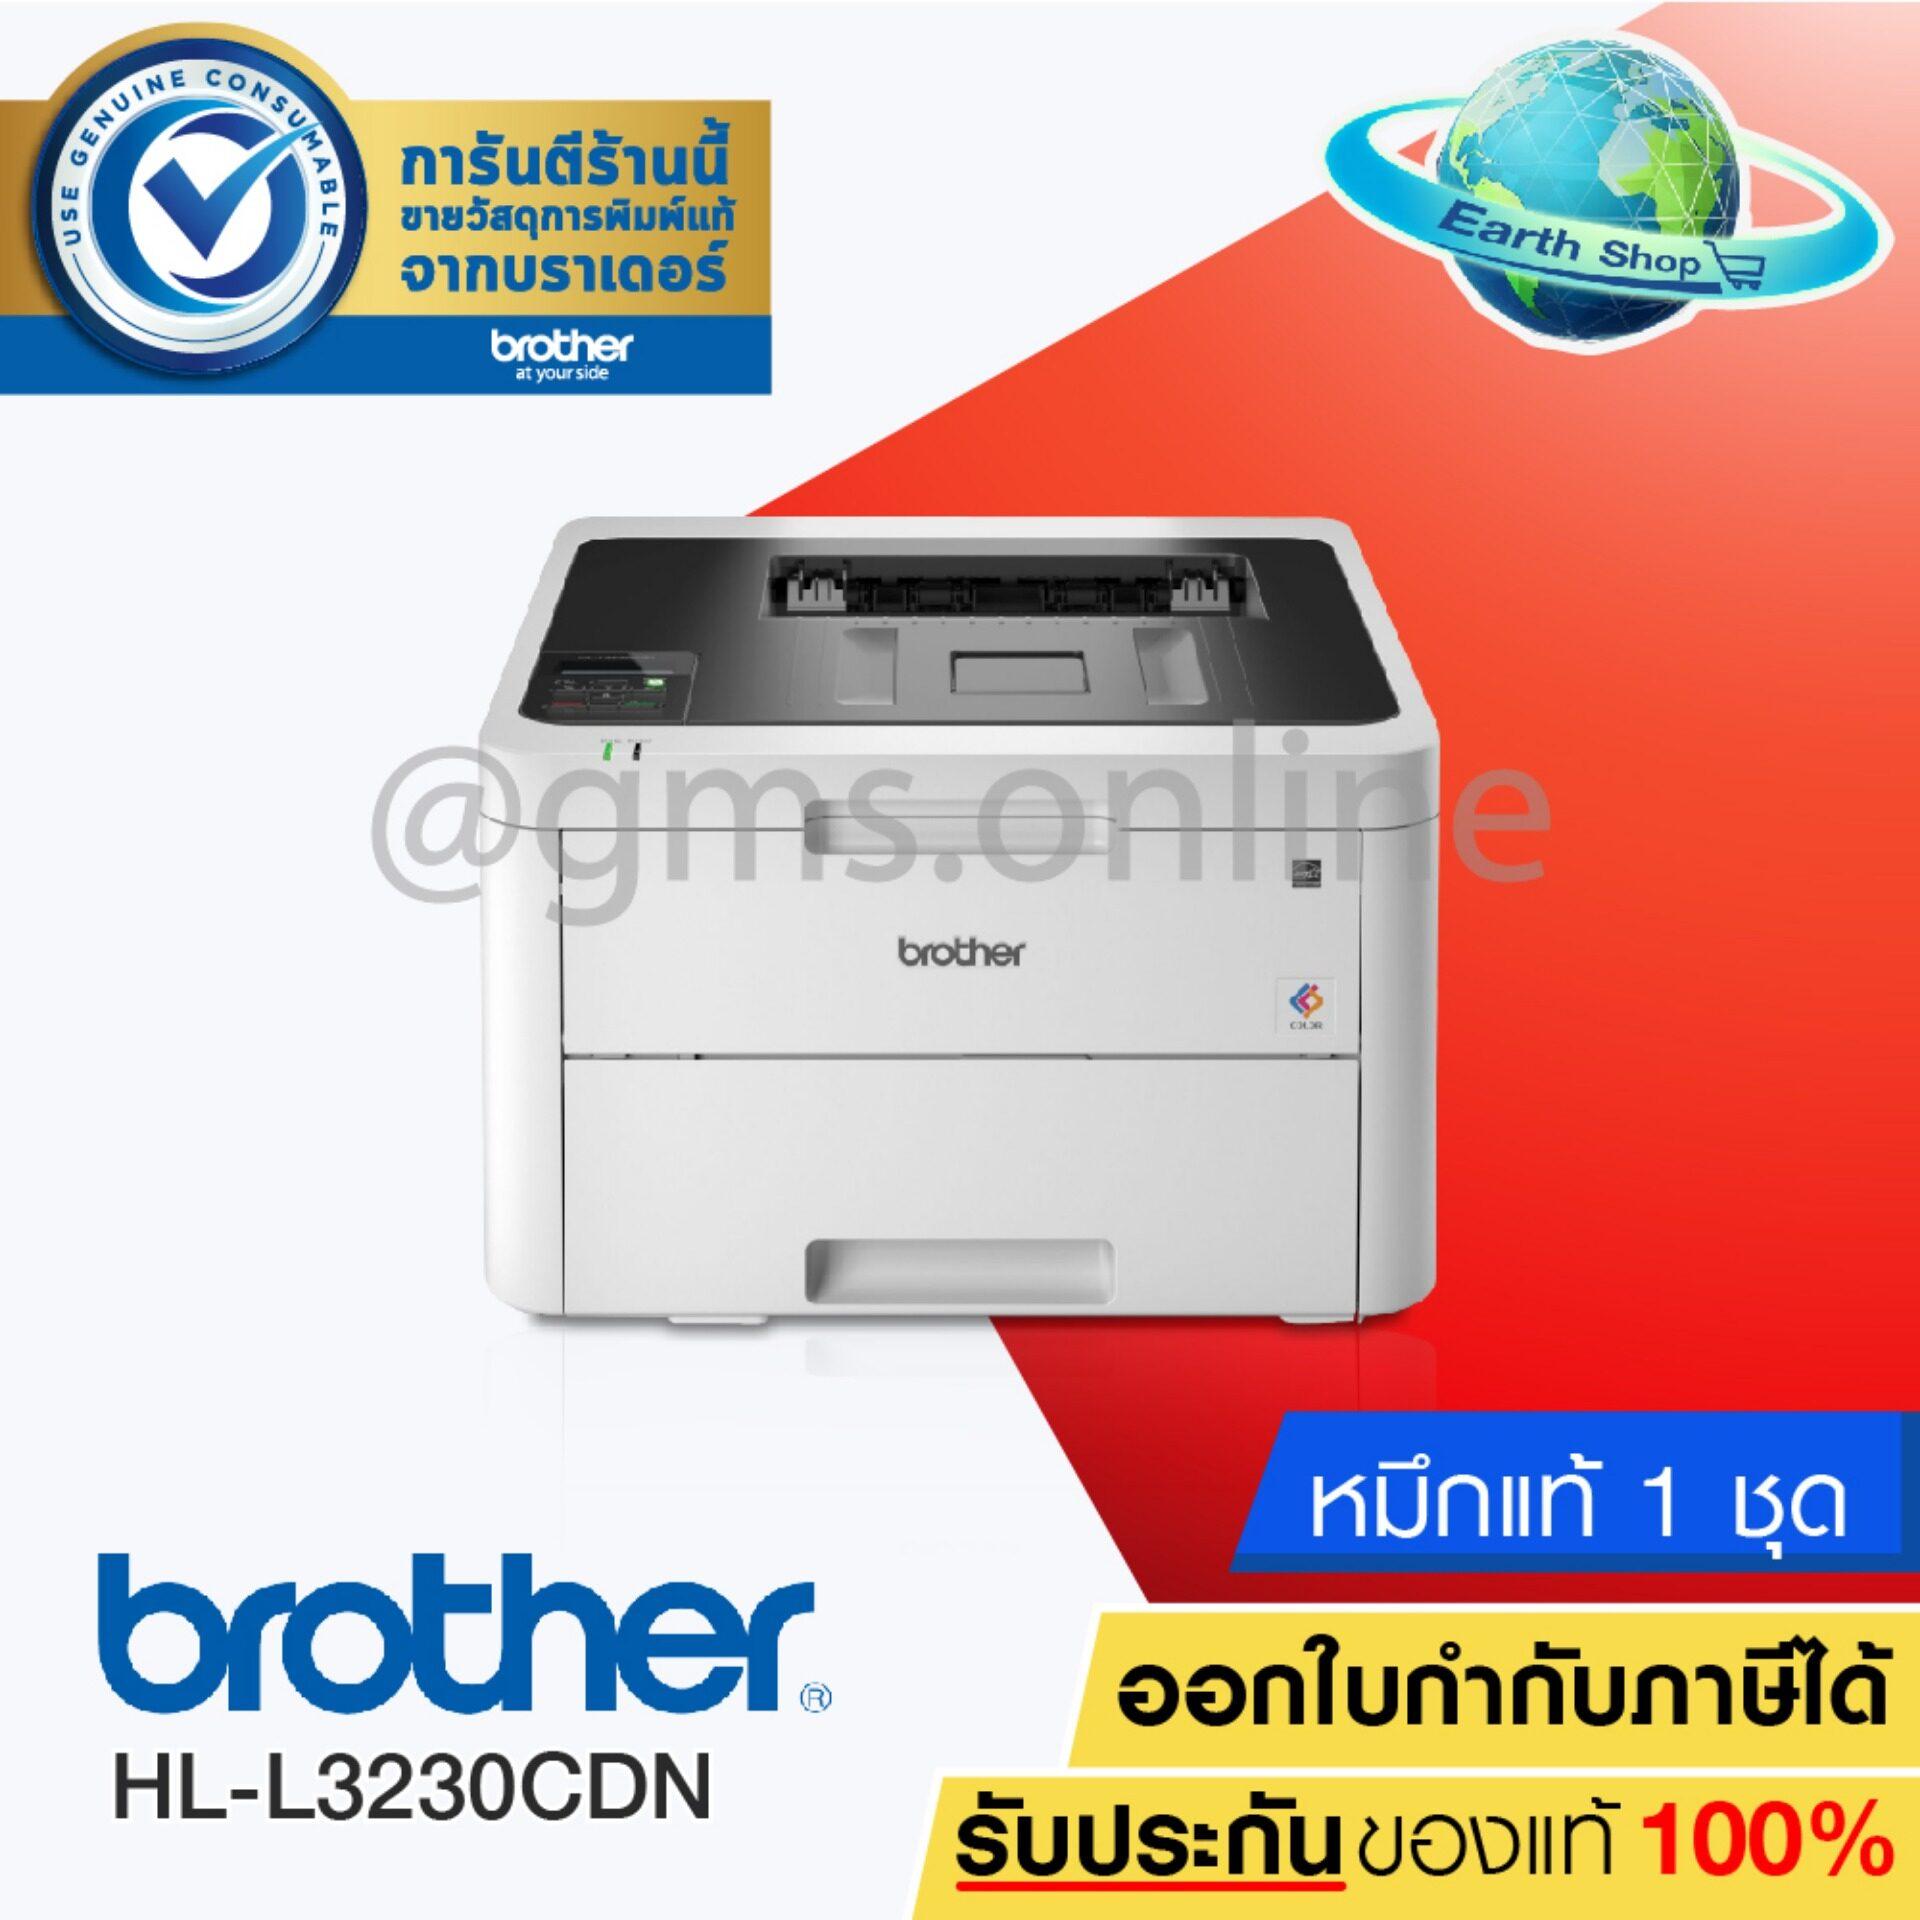 Earth Shop Printer Color  Brother Hl-L3230cdn พร้อมหมึกแท้ 4 สี Earth Shop.